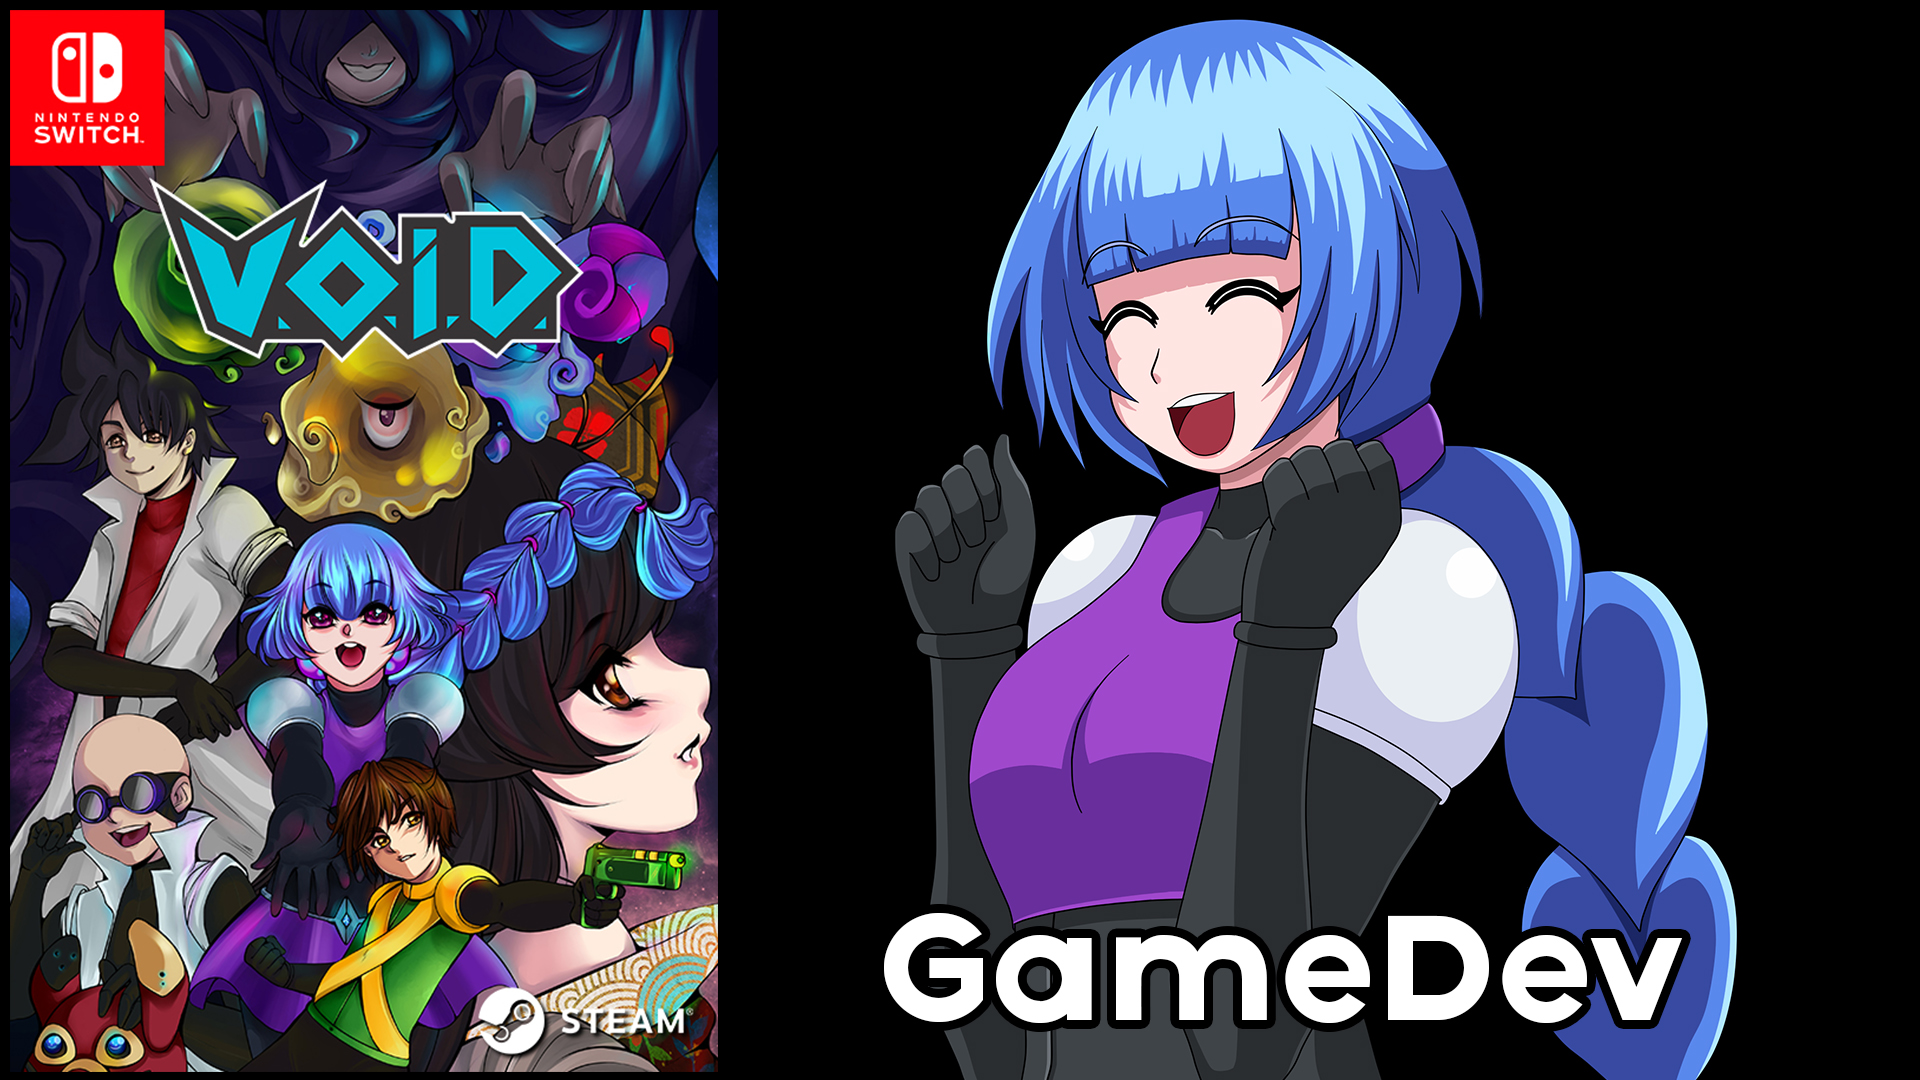 V.O.I.D. GameDev